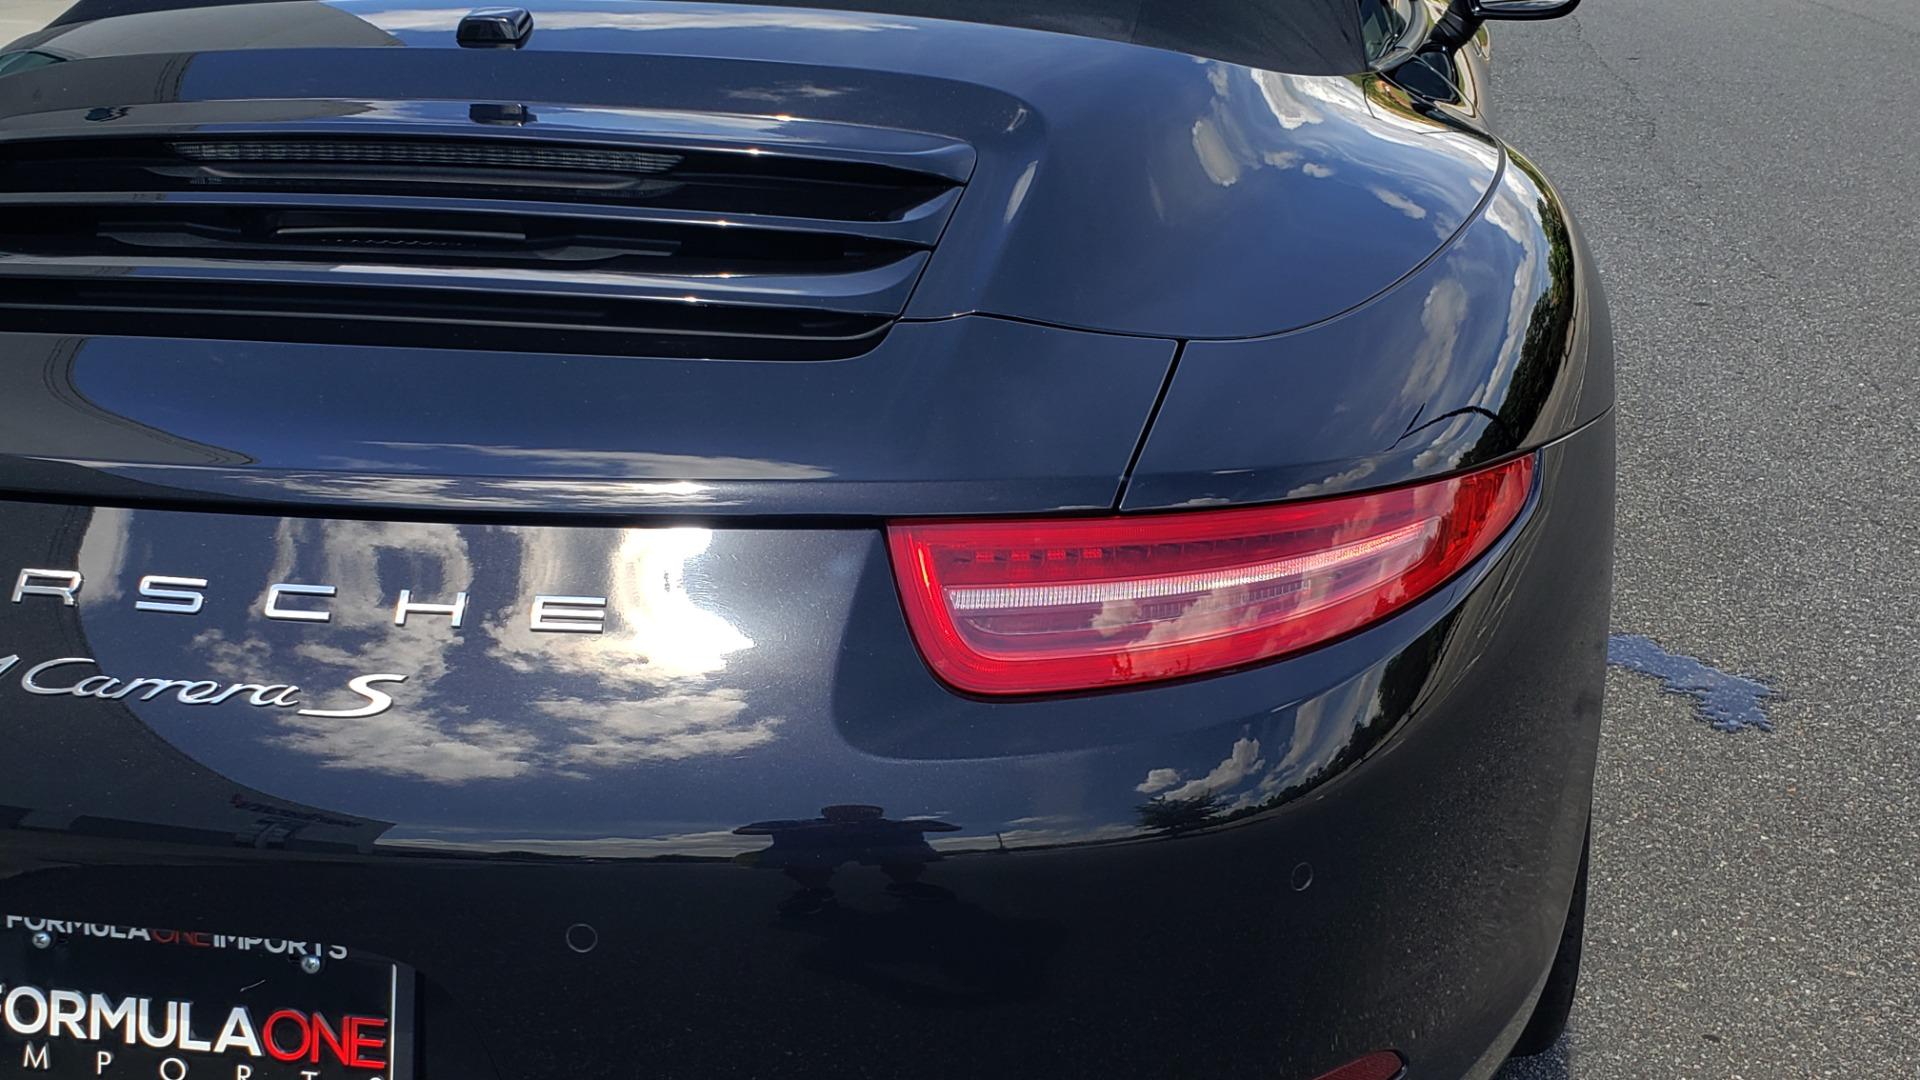 Used 2014 Porsche 911 CARRERA S CABRIOLET / PREM PKG / PDK / NAV / BOSE / SPORT CHRONO for sale $81,995 at Formula Imports in Charlotte NC 28227 61